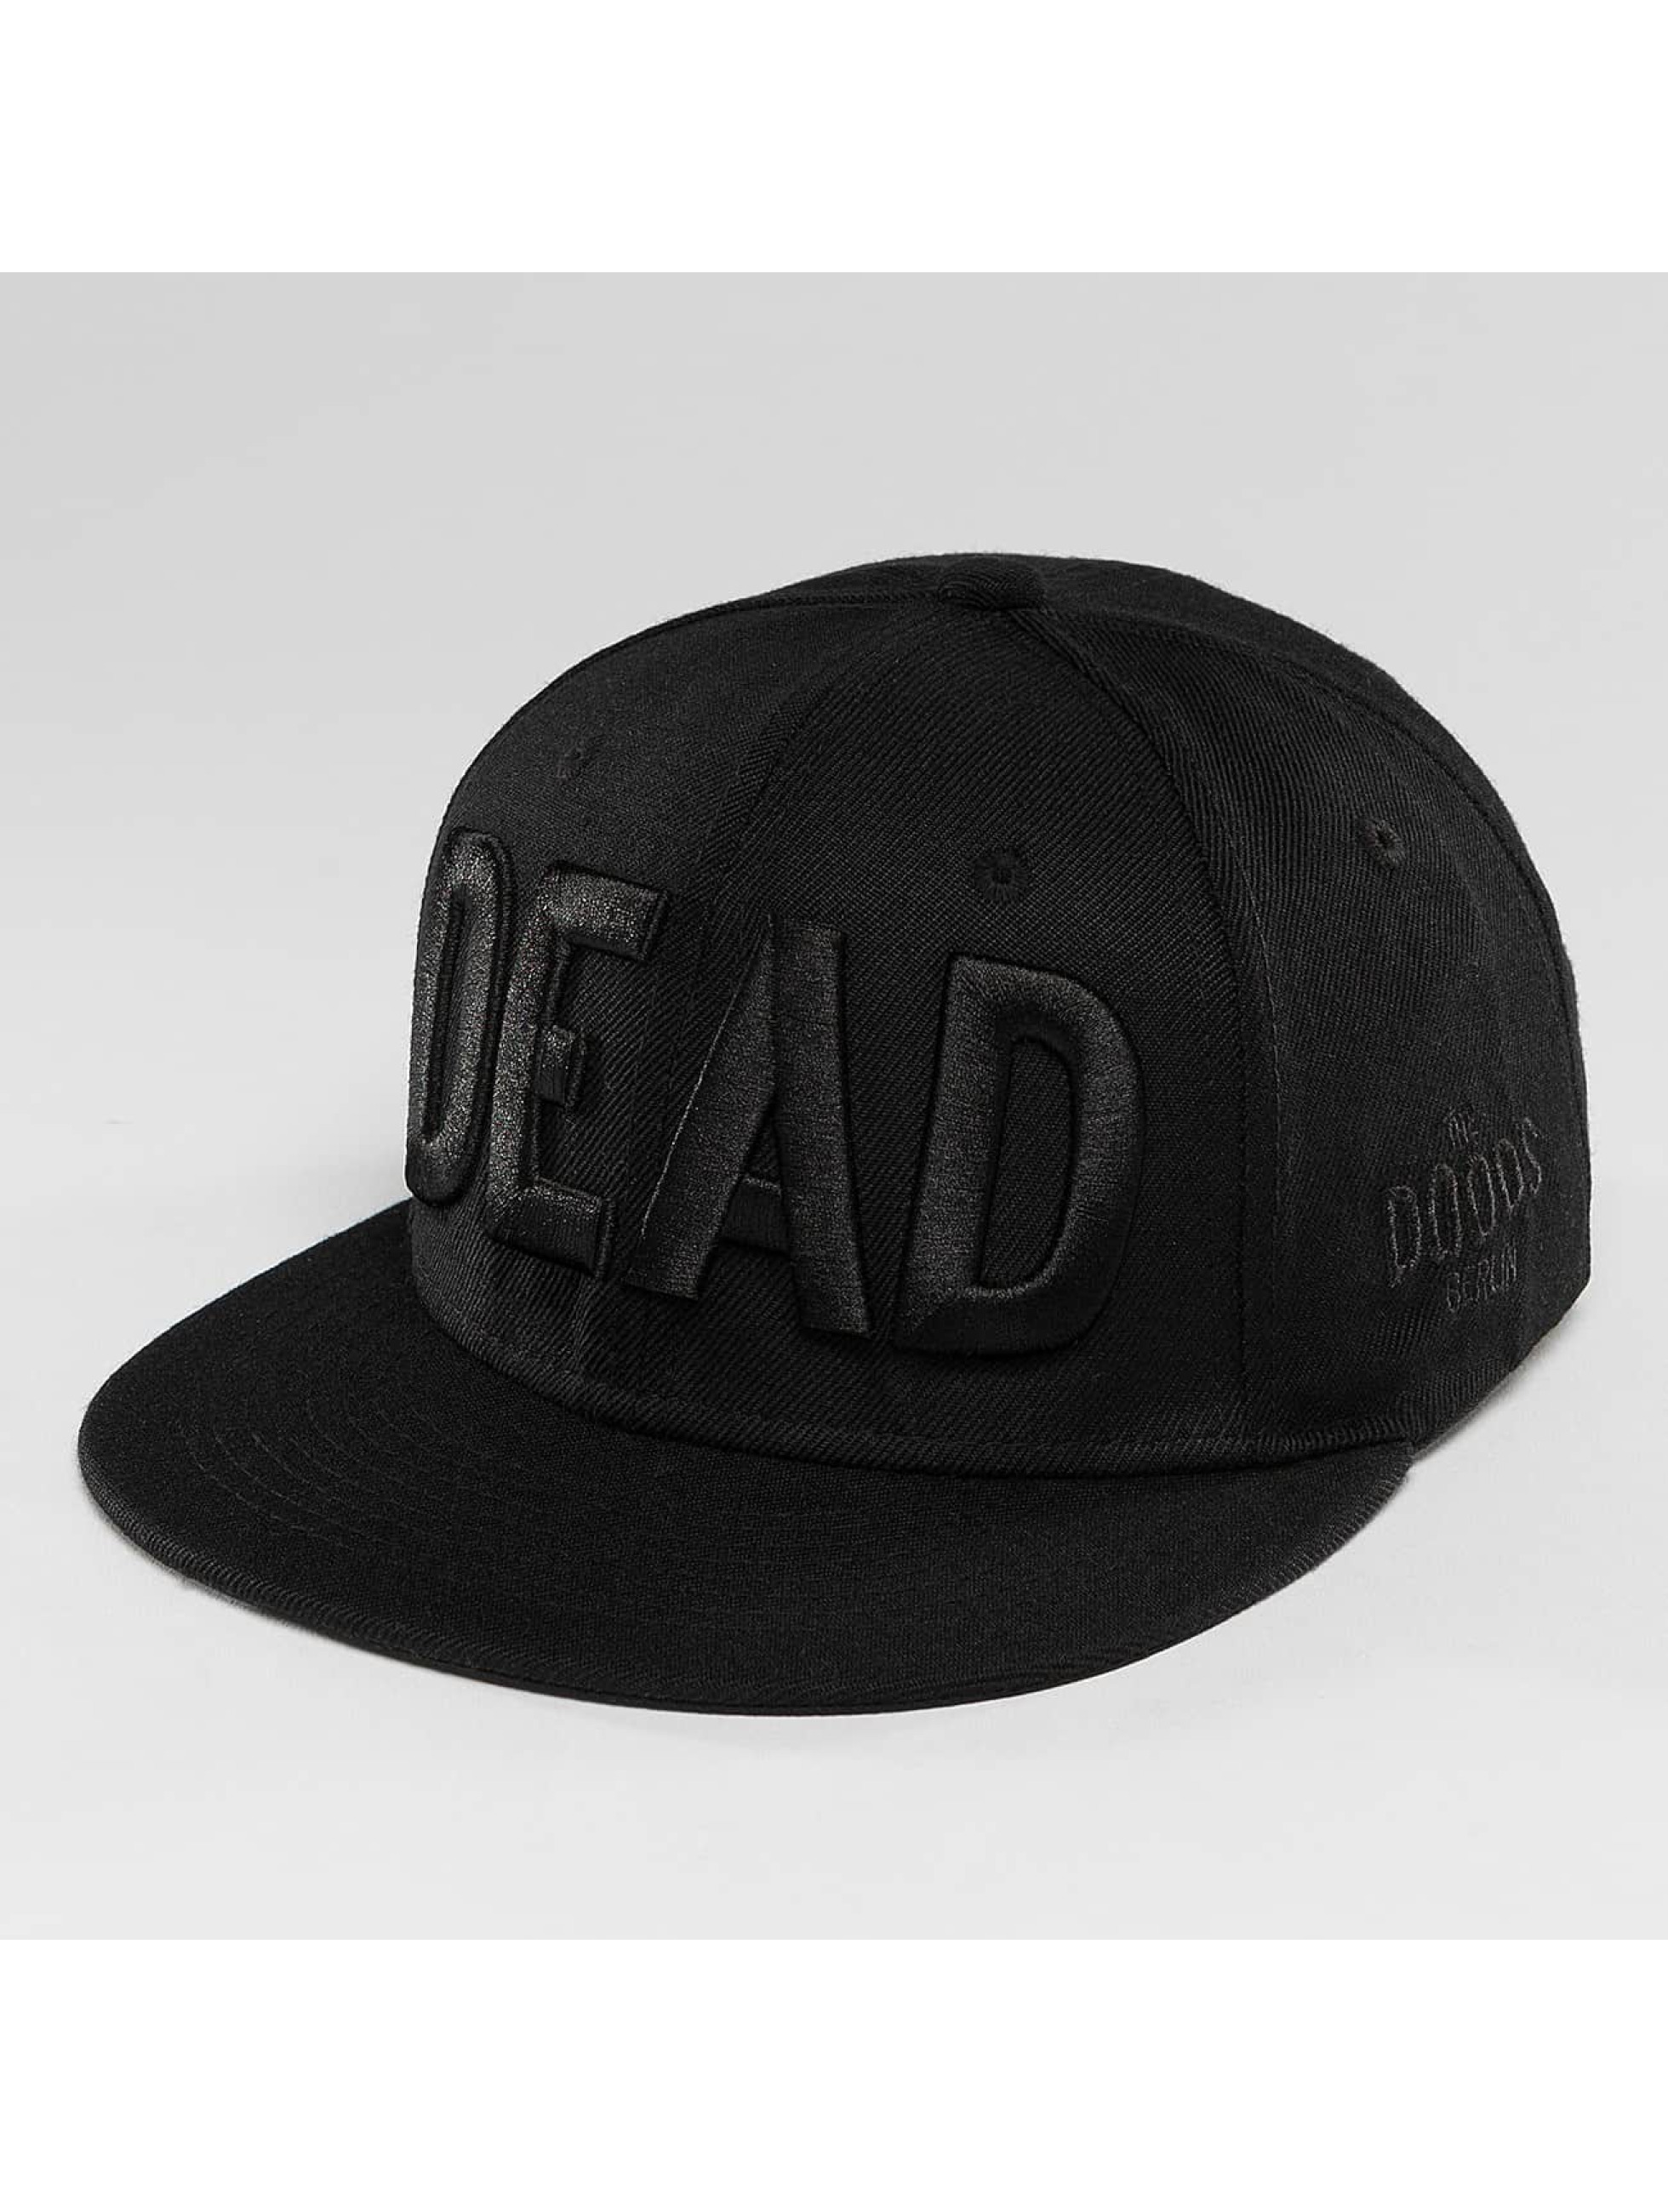 The Dudes Männer,Frauen Snapback Cap DEAD in schwarz